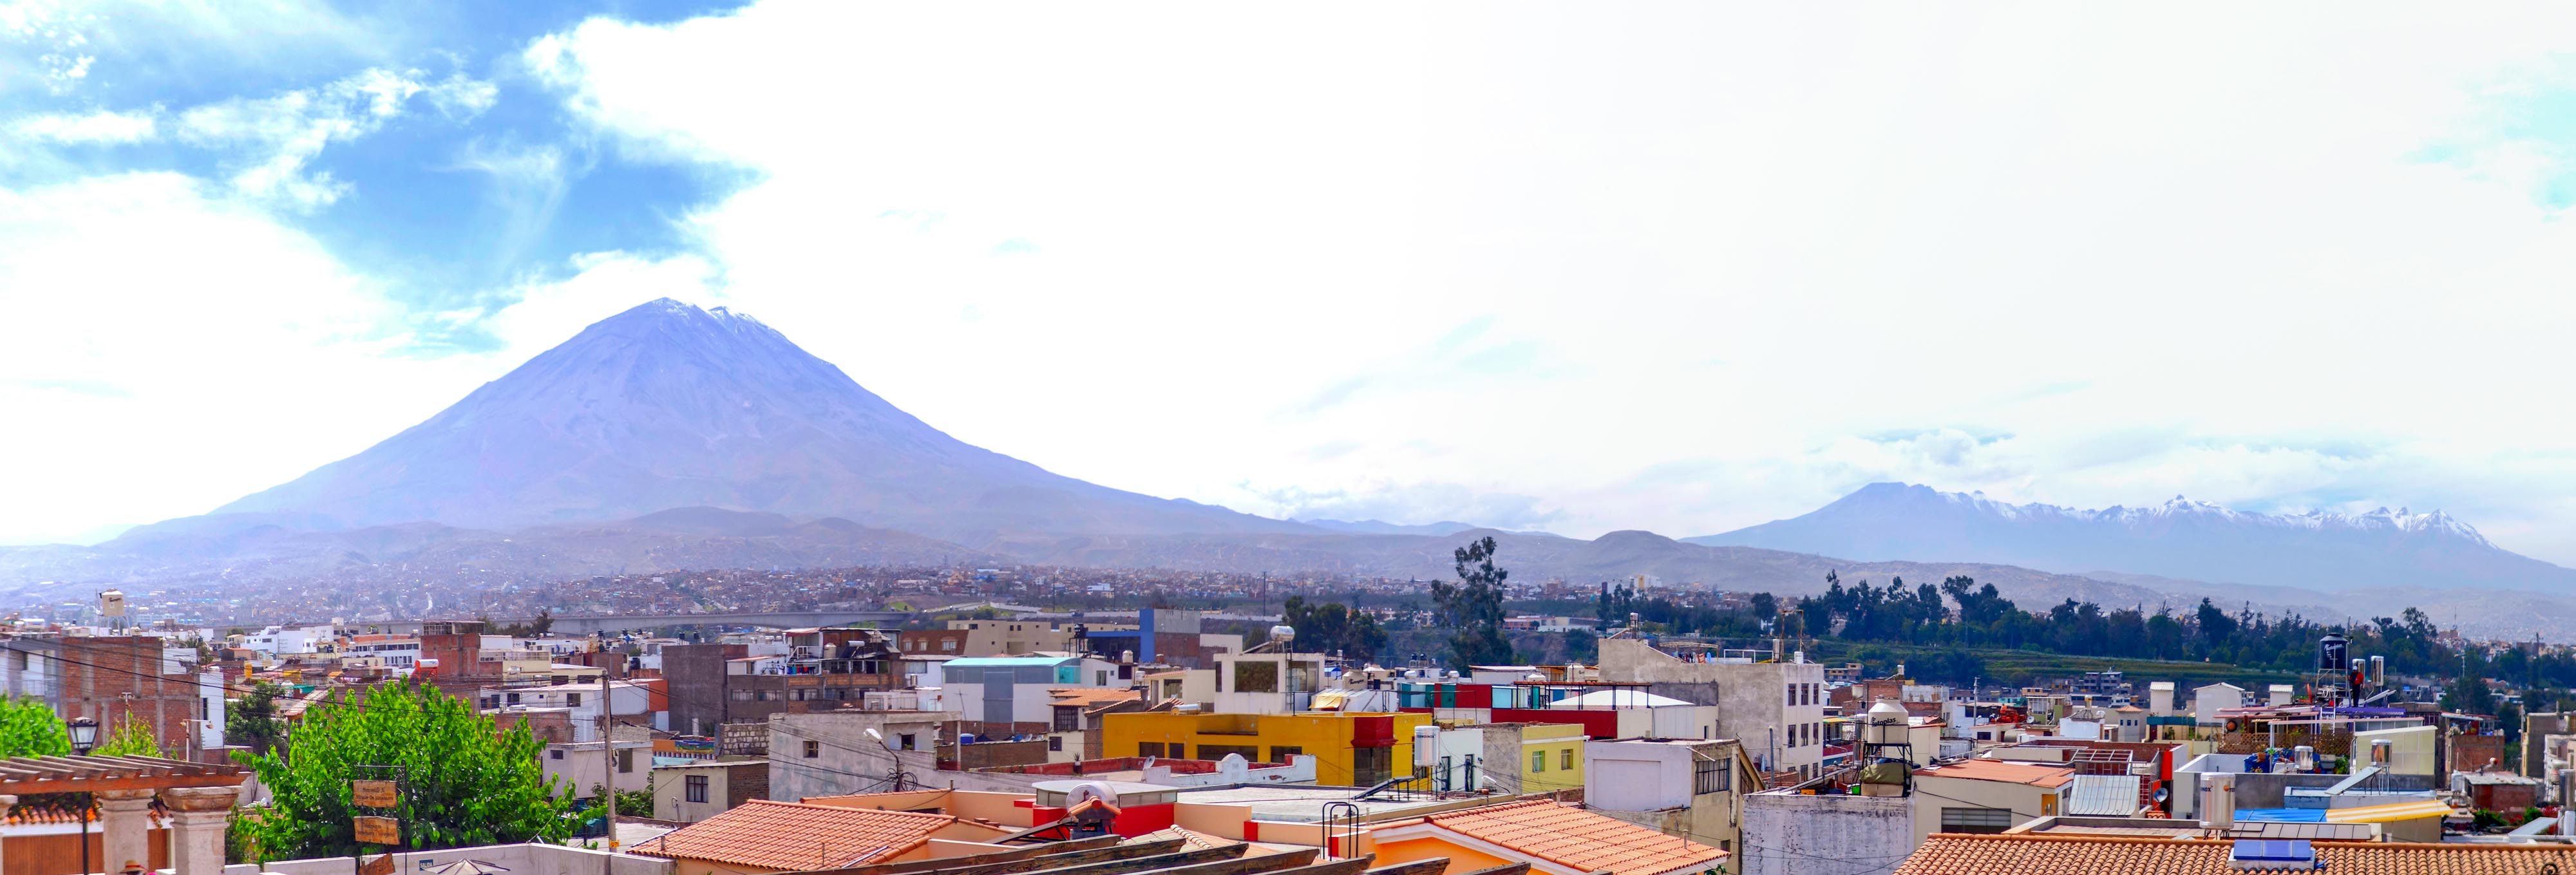 Le volcan Misti est impressionnant